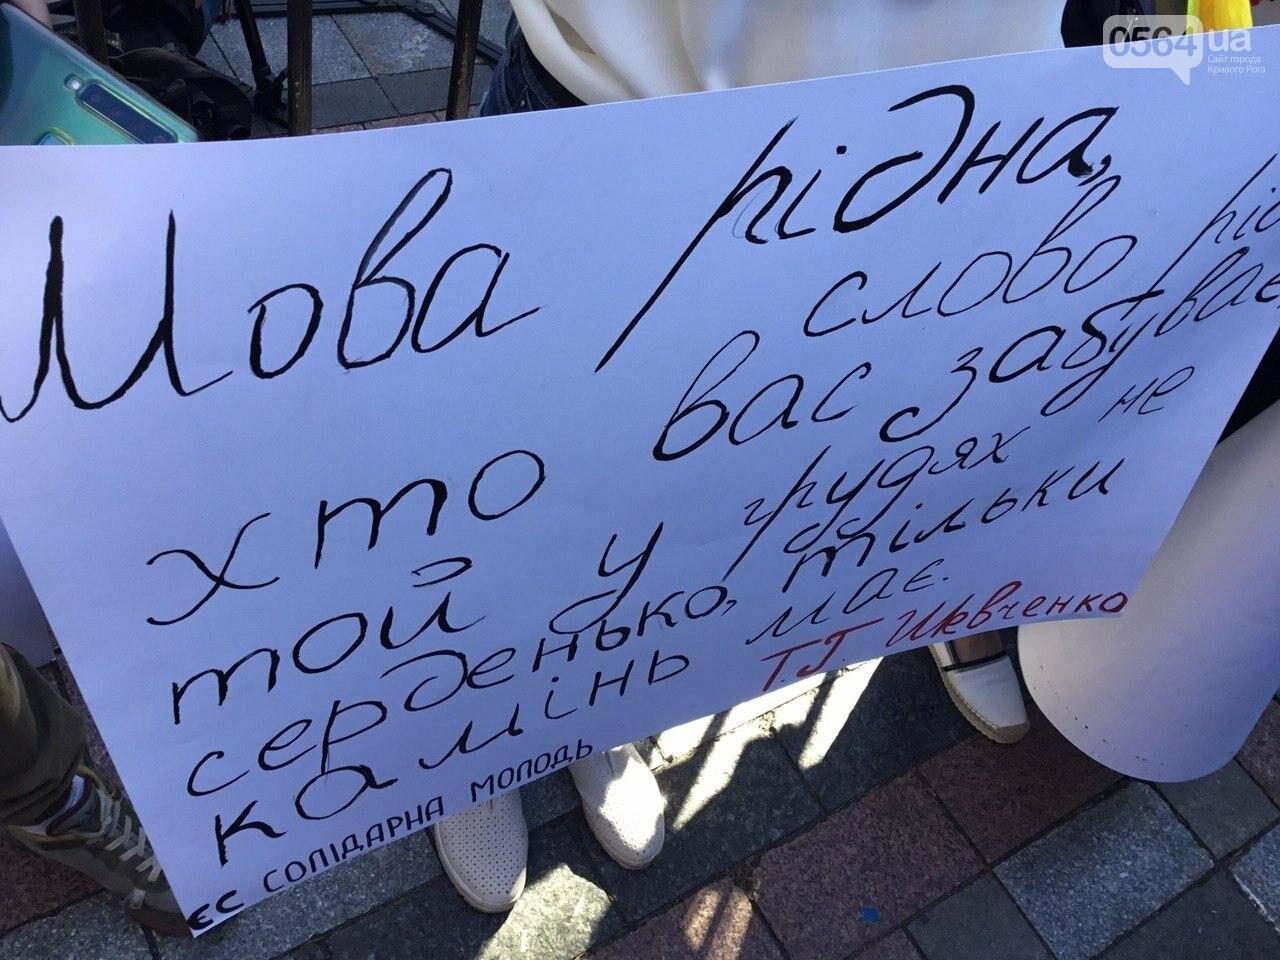 """Руки геть від мови"": под стенами Верховной рады проходит акция протеста, - ФОТО, ВИДЕО, фото-25"